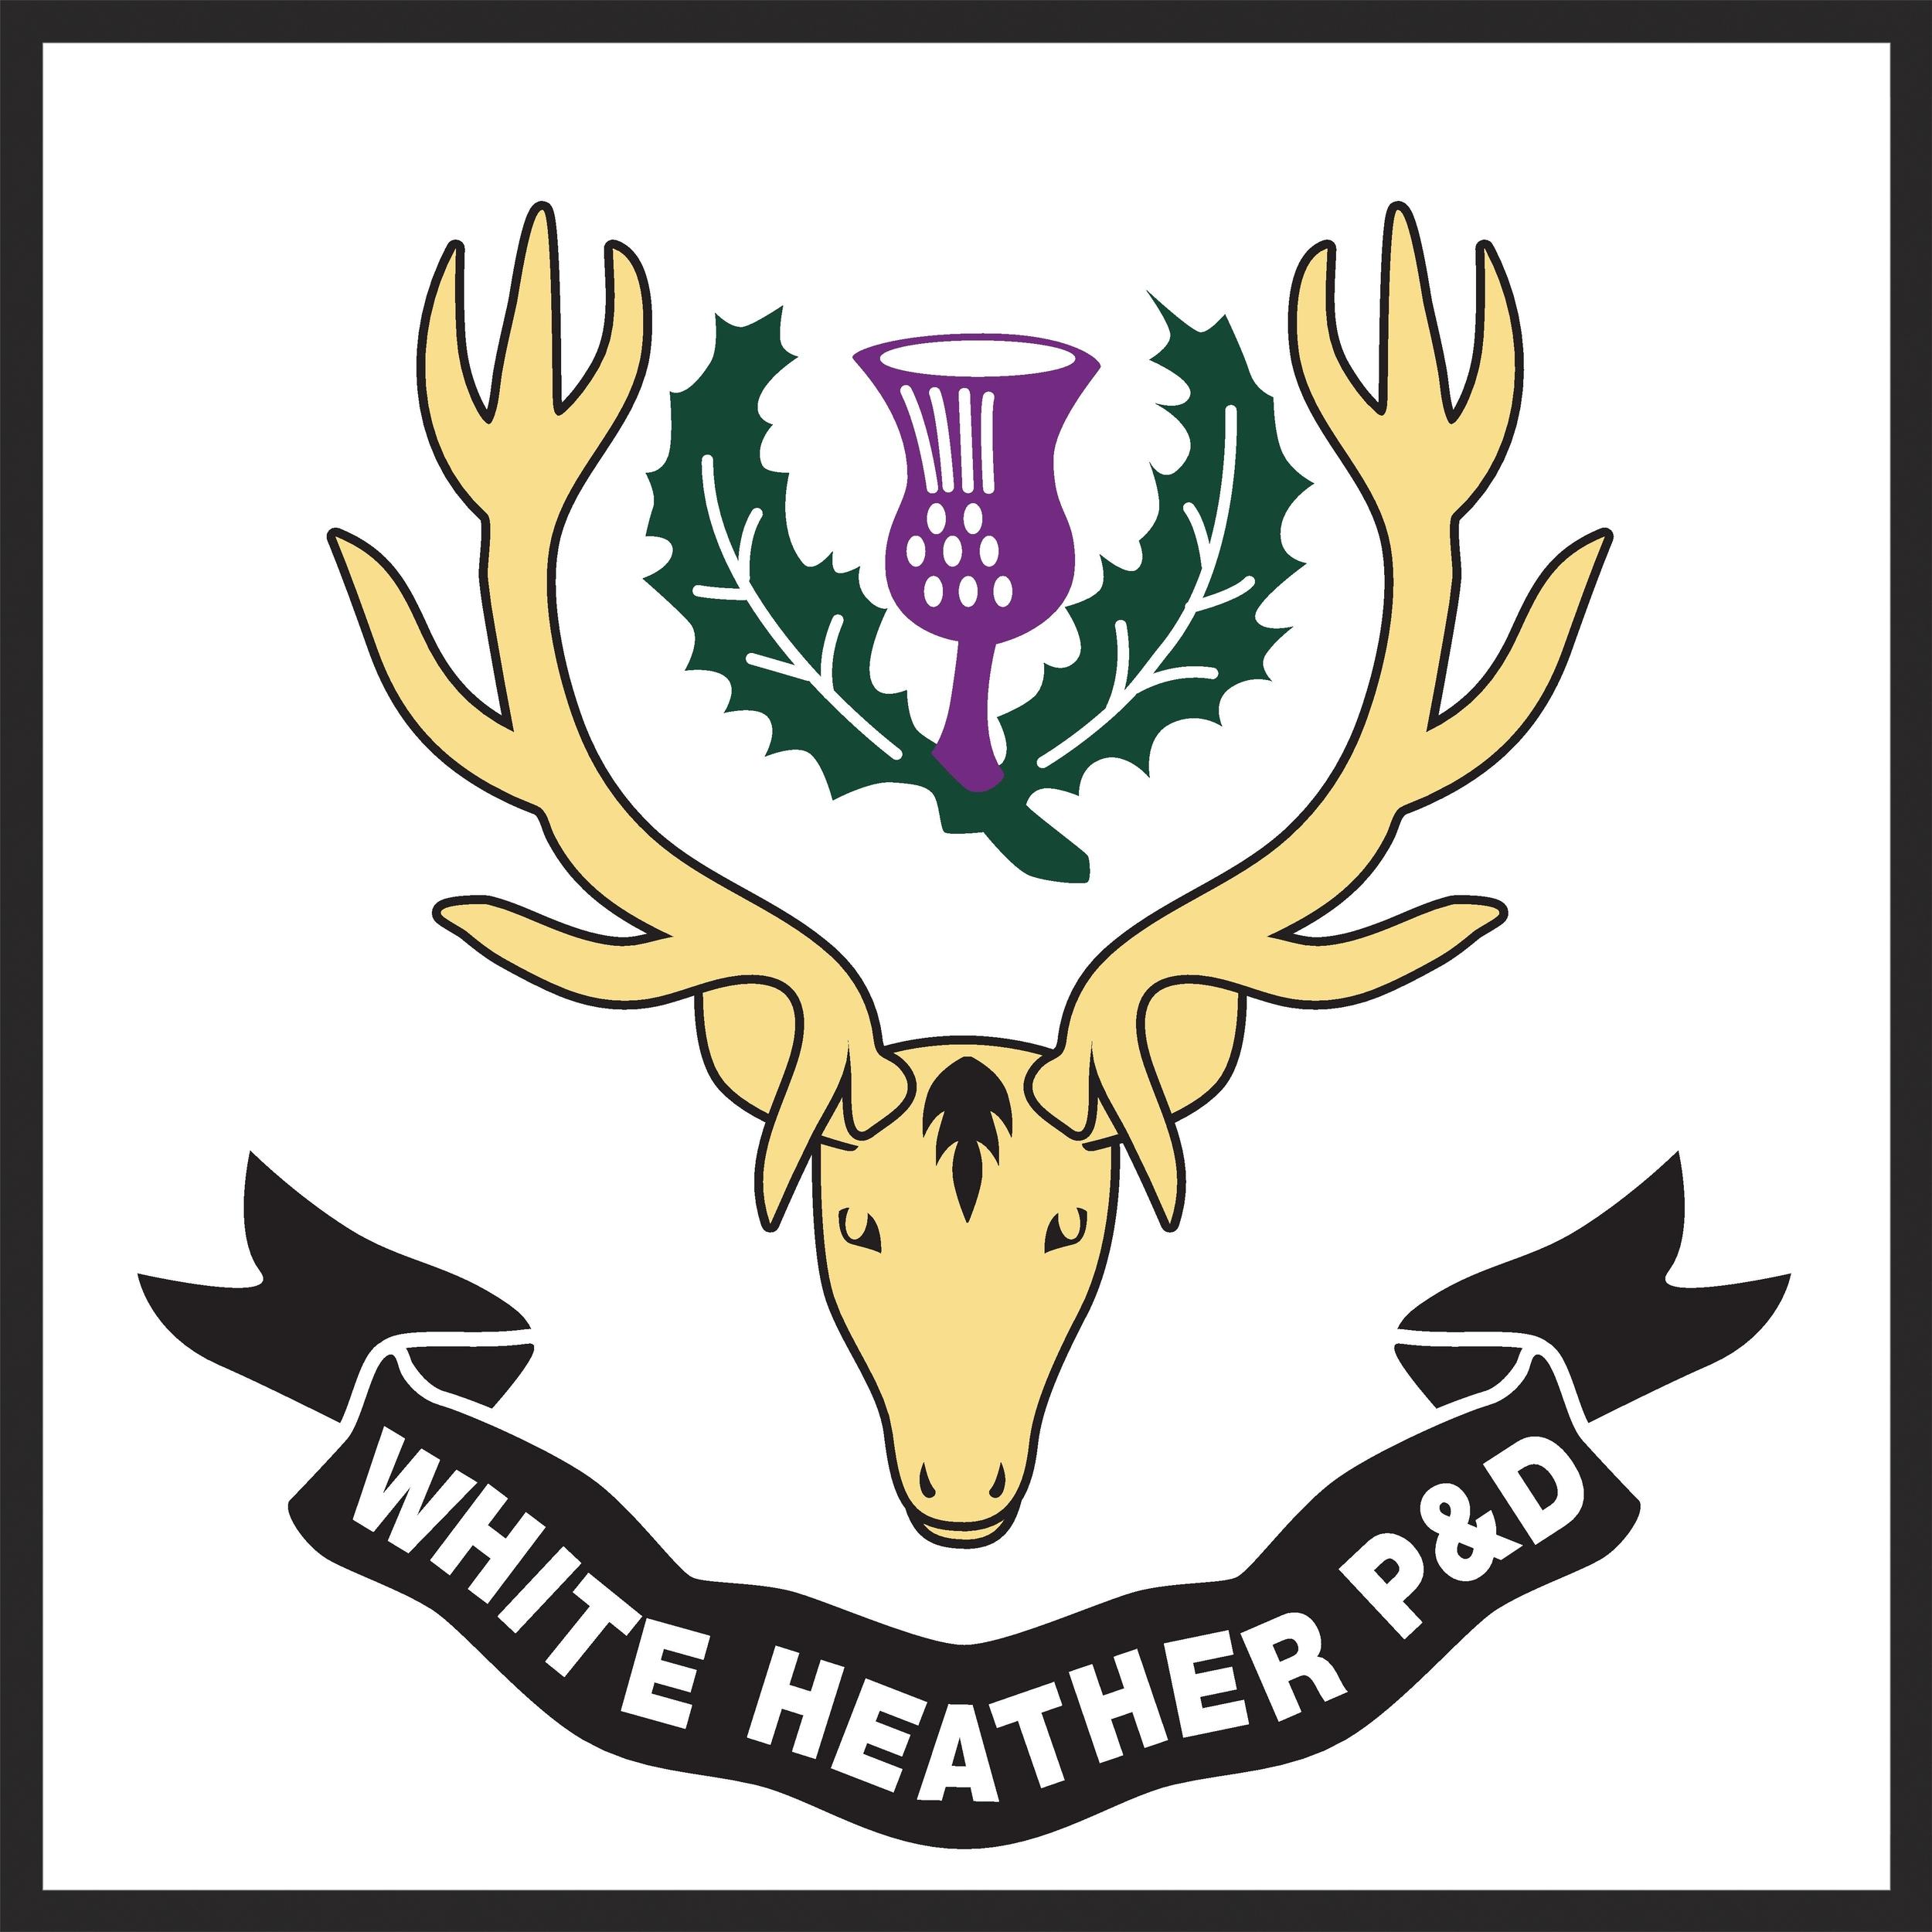 WhiteHeatherCrest-FINAL-page-001 (2).jpg